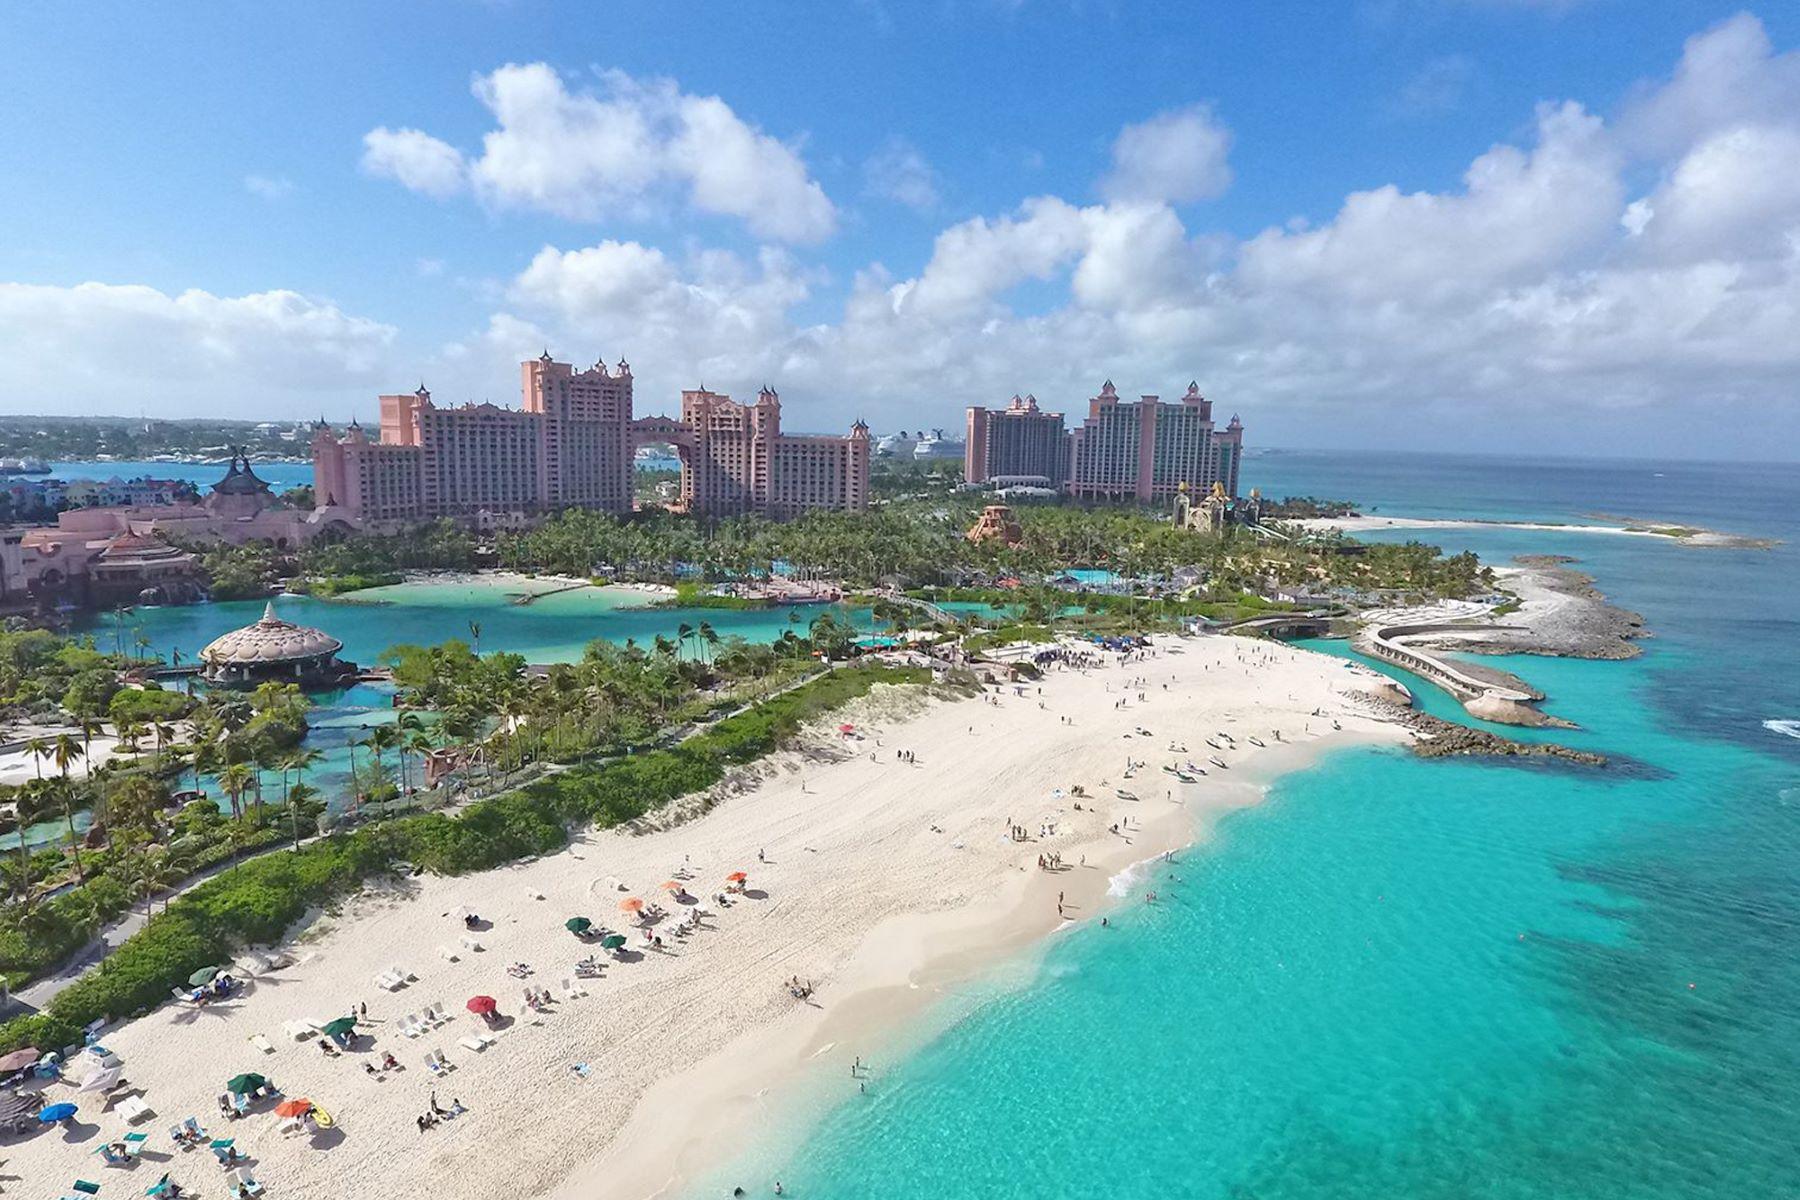 شقة بعمارة للـ Sale في The Reef at Atlantis 21-923 The Reef At Atlantis, Paradise Island, Nassau And Paradise Island Bahamas